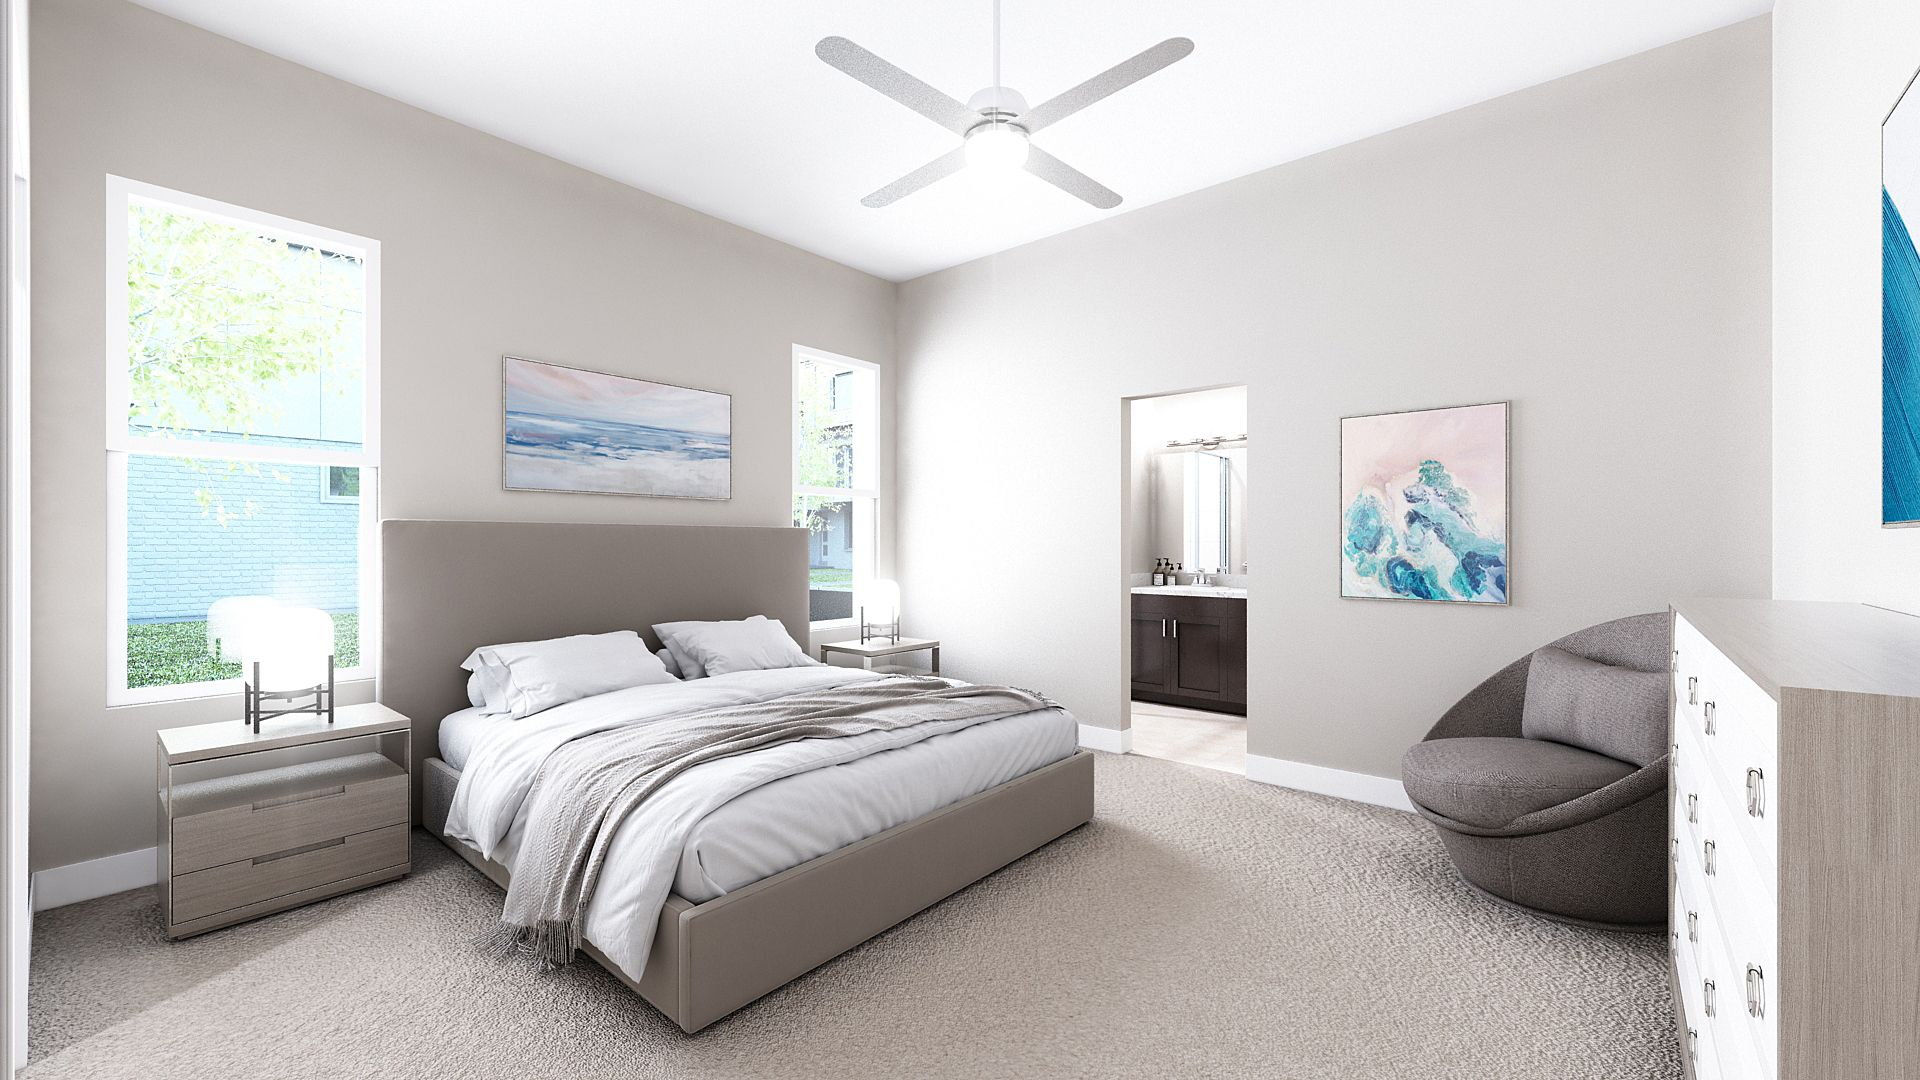 Bedroom featured in the C Plan By Koelbel Urban Homes in Denver, CO